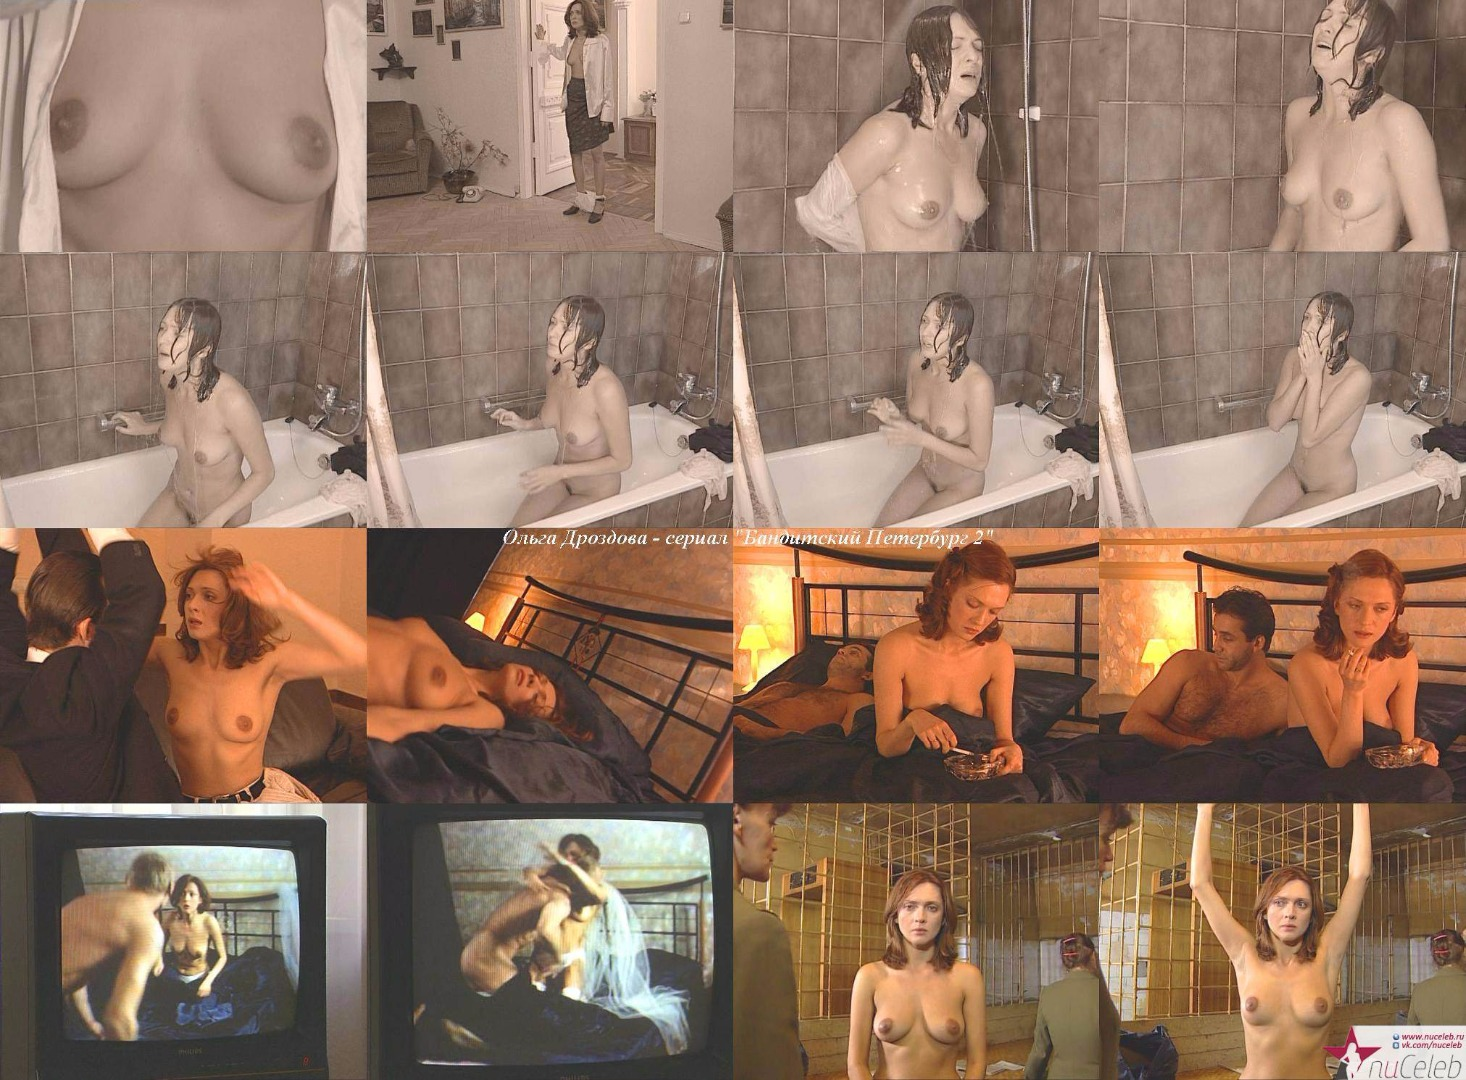 rossiyskie-filmi-s-erotikoy